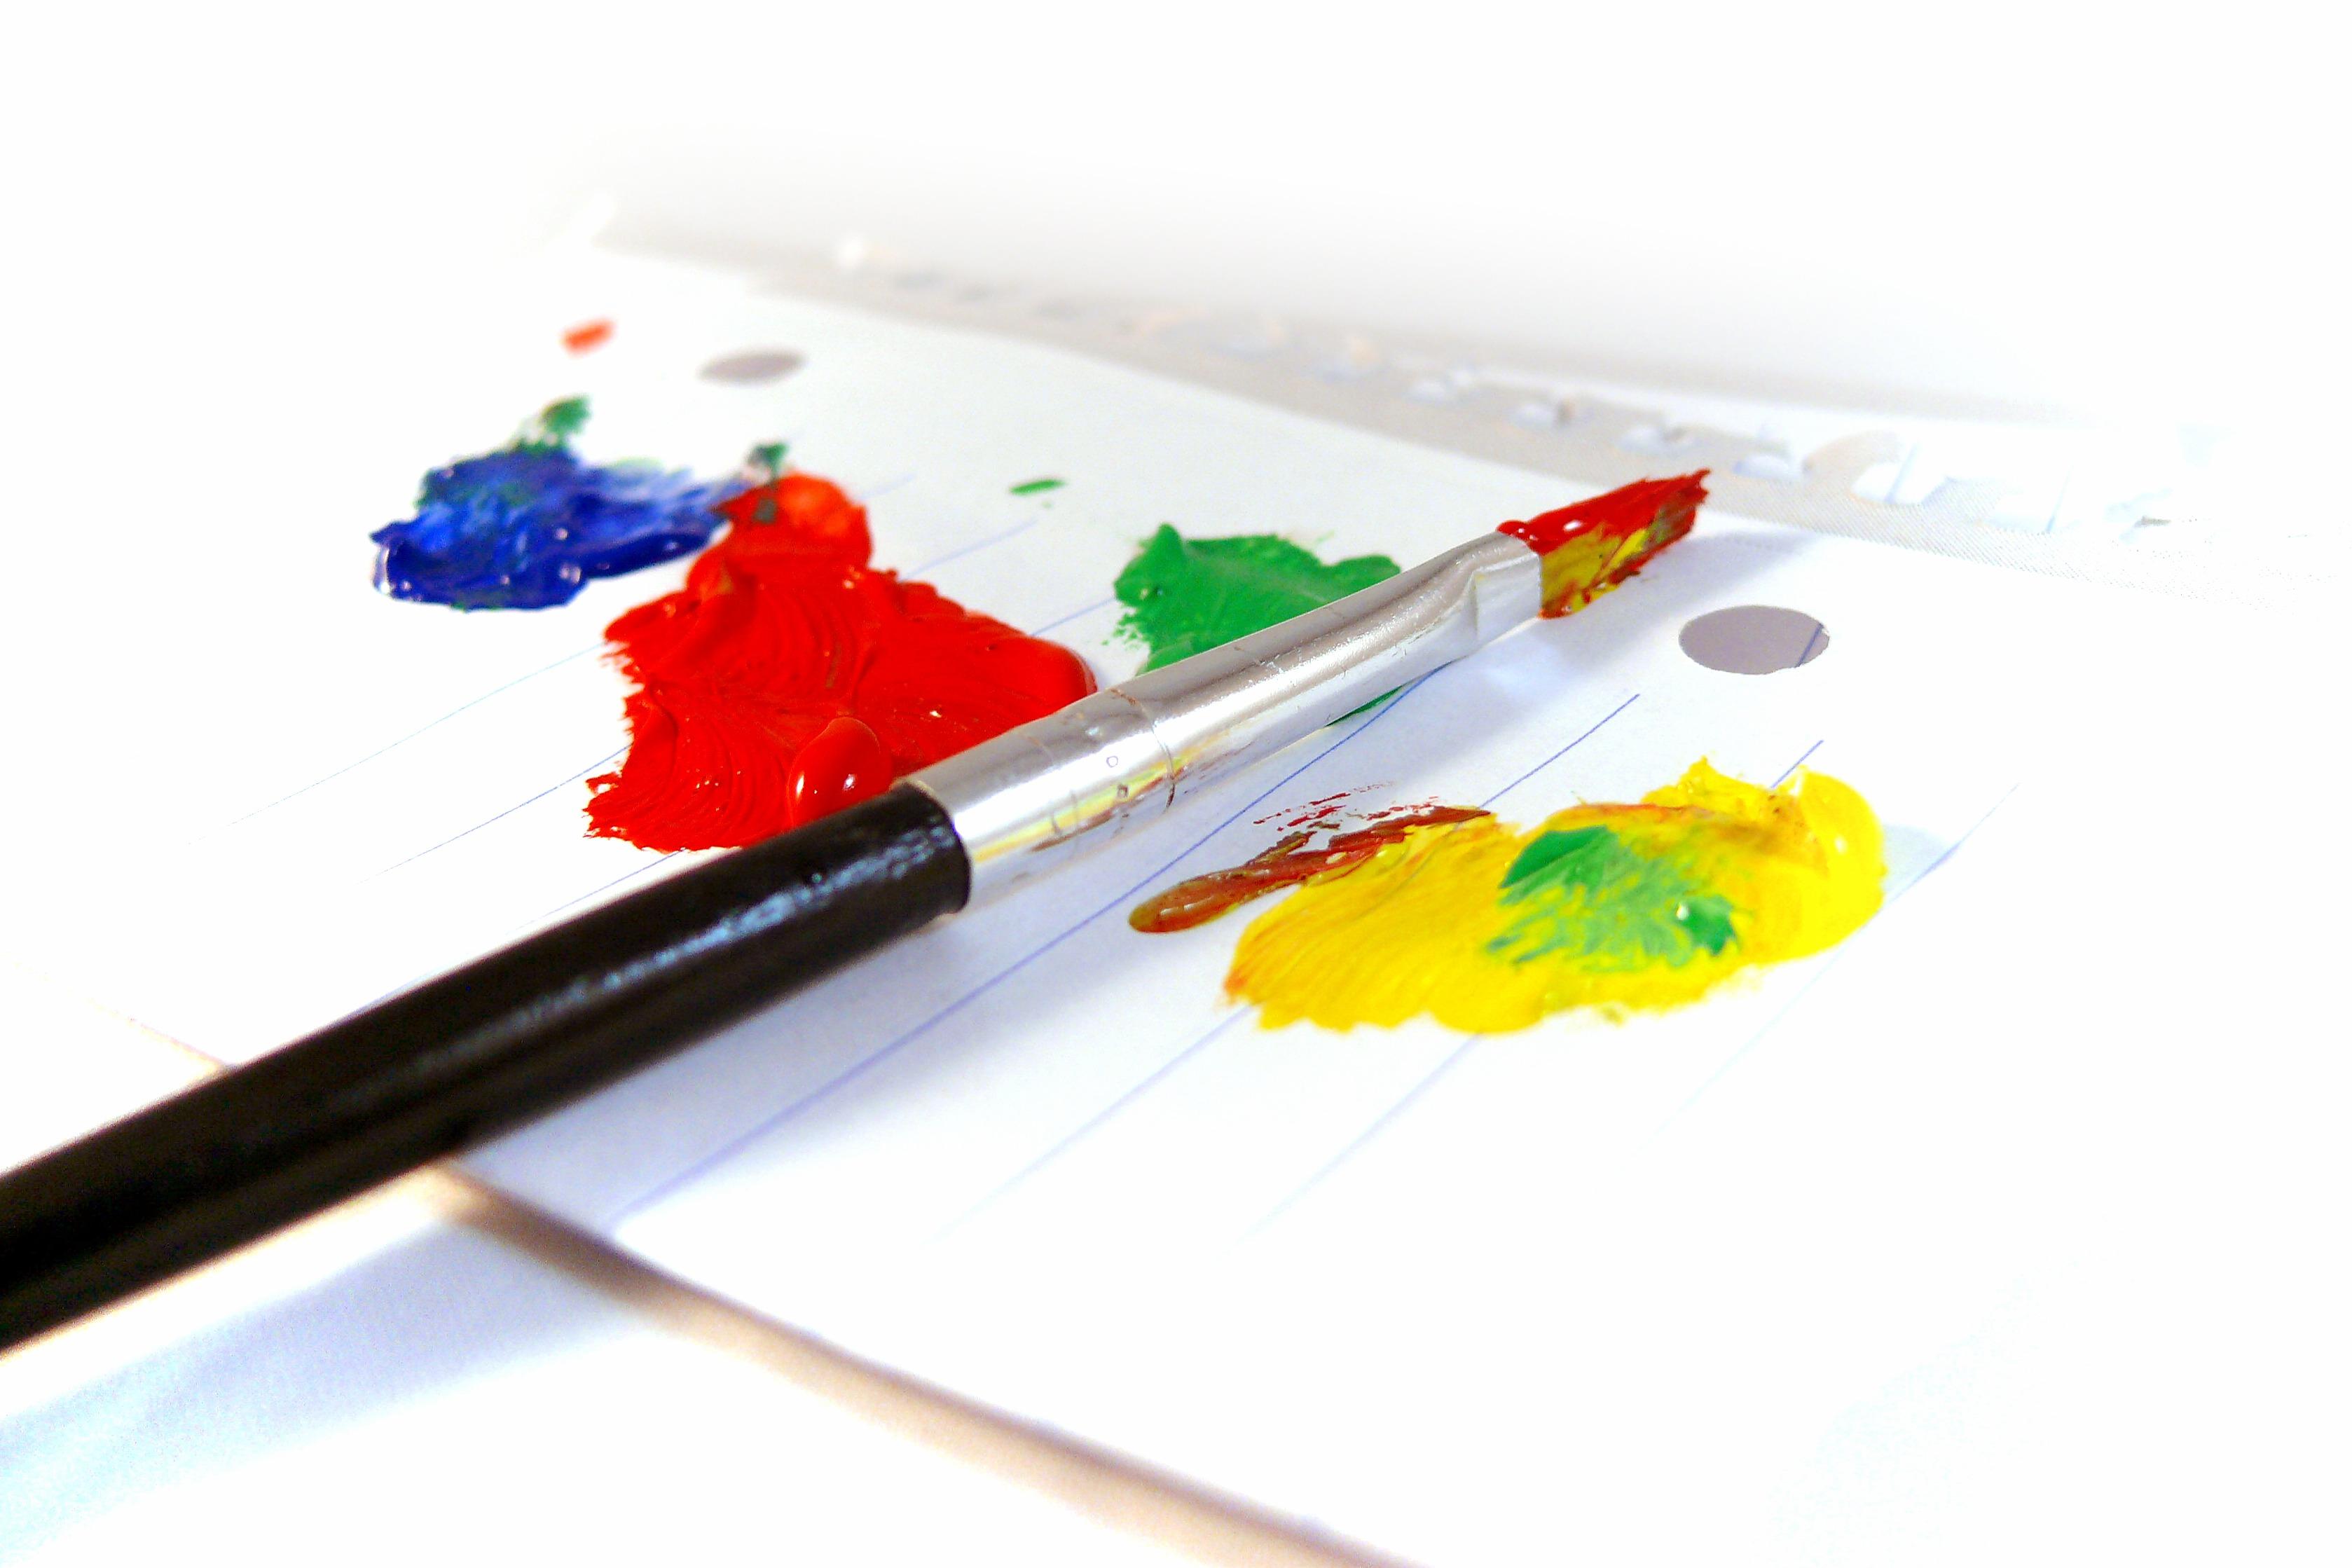 Free Images : pencil, creative, brush, decoration, color